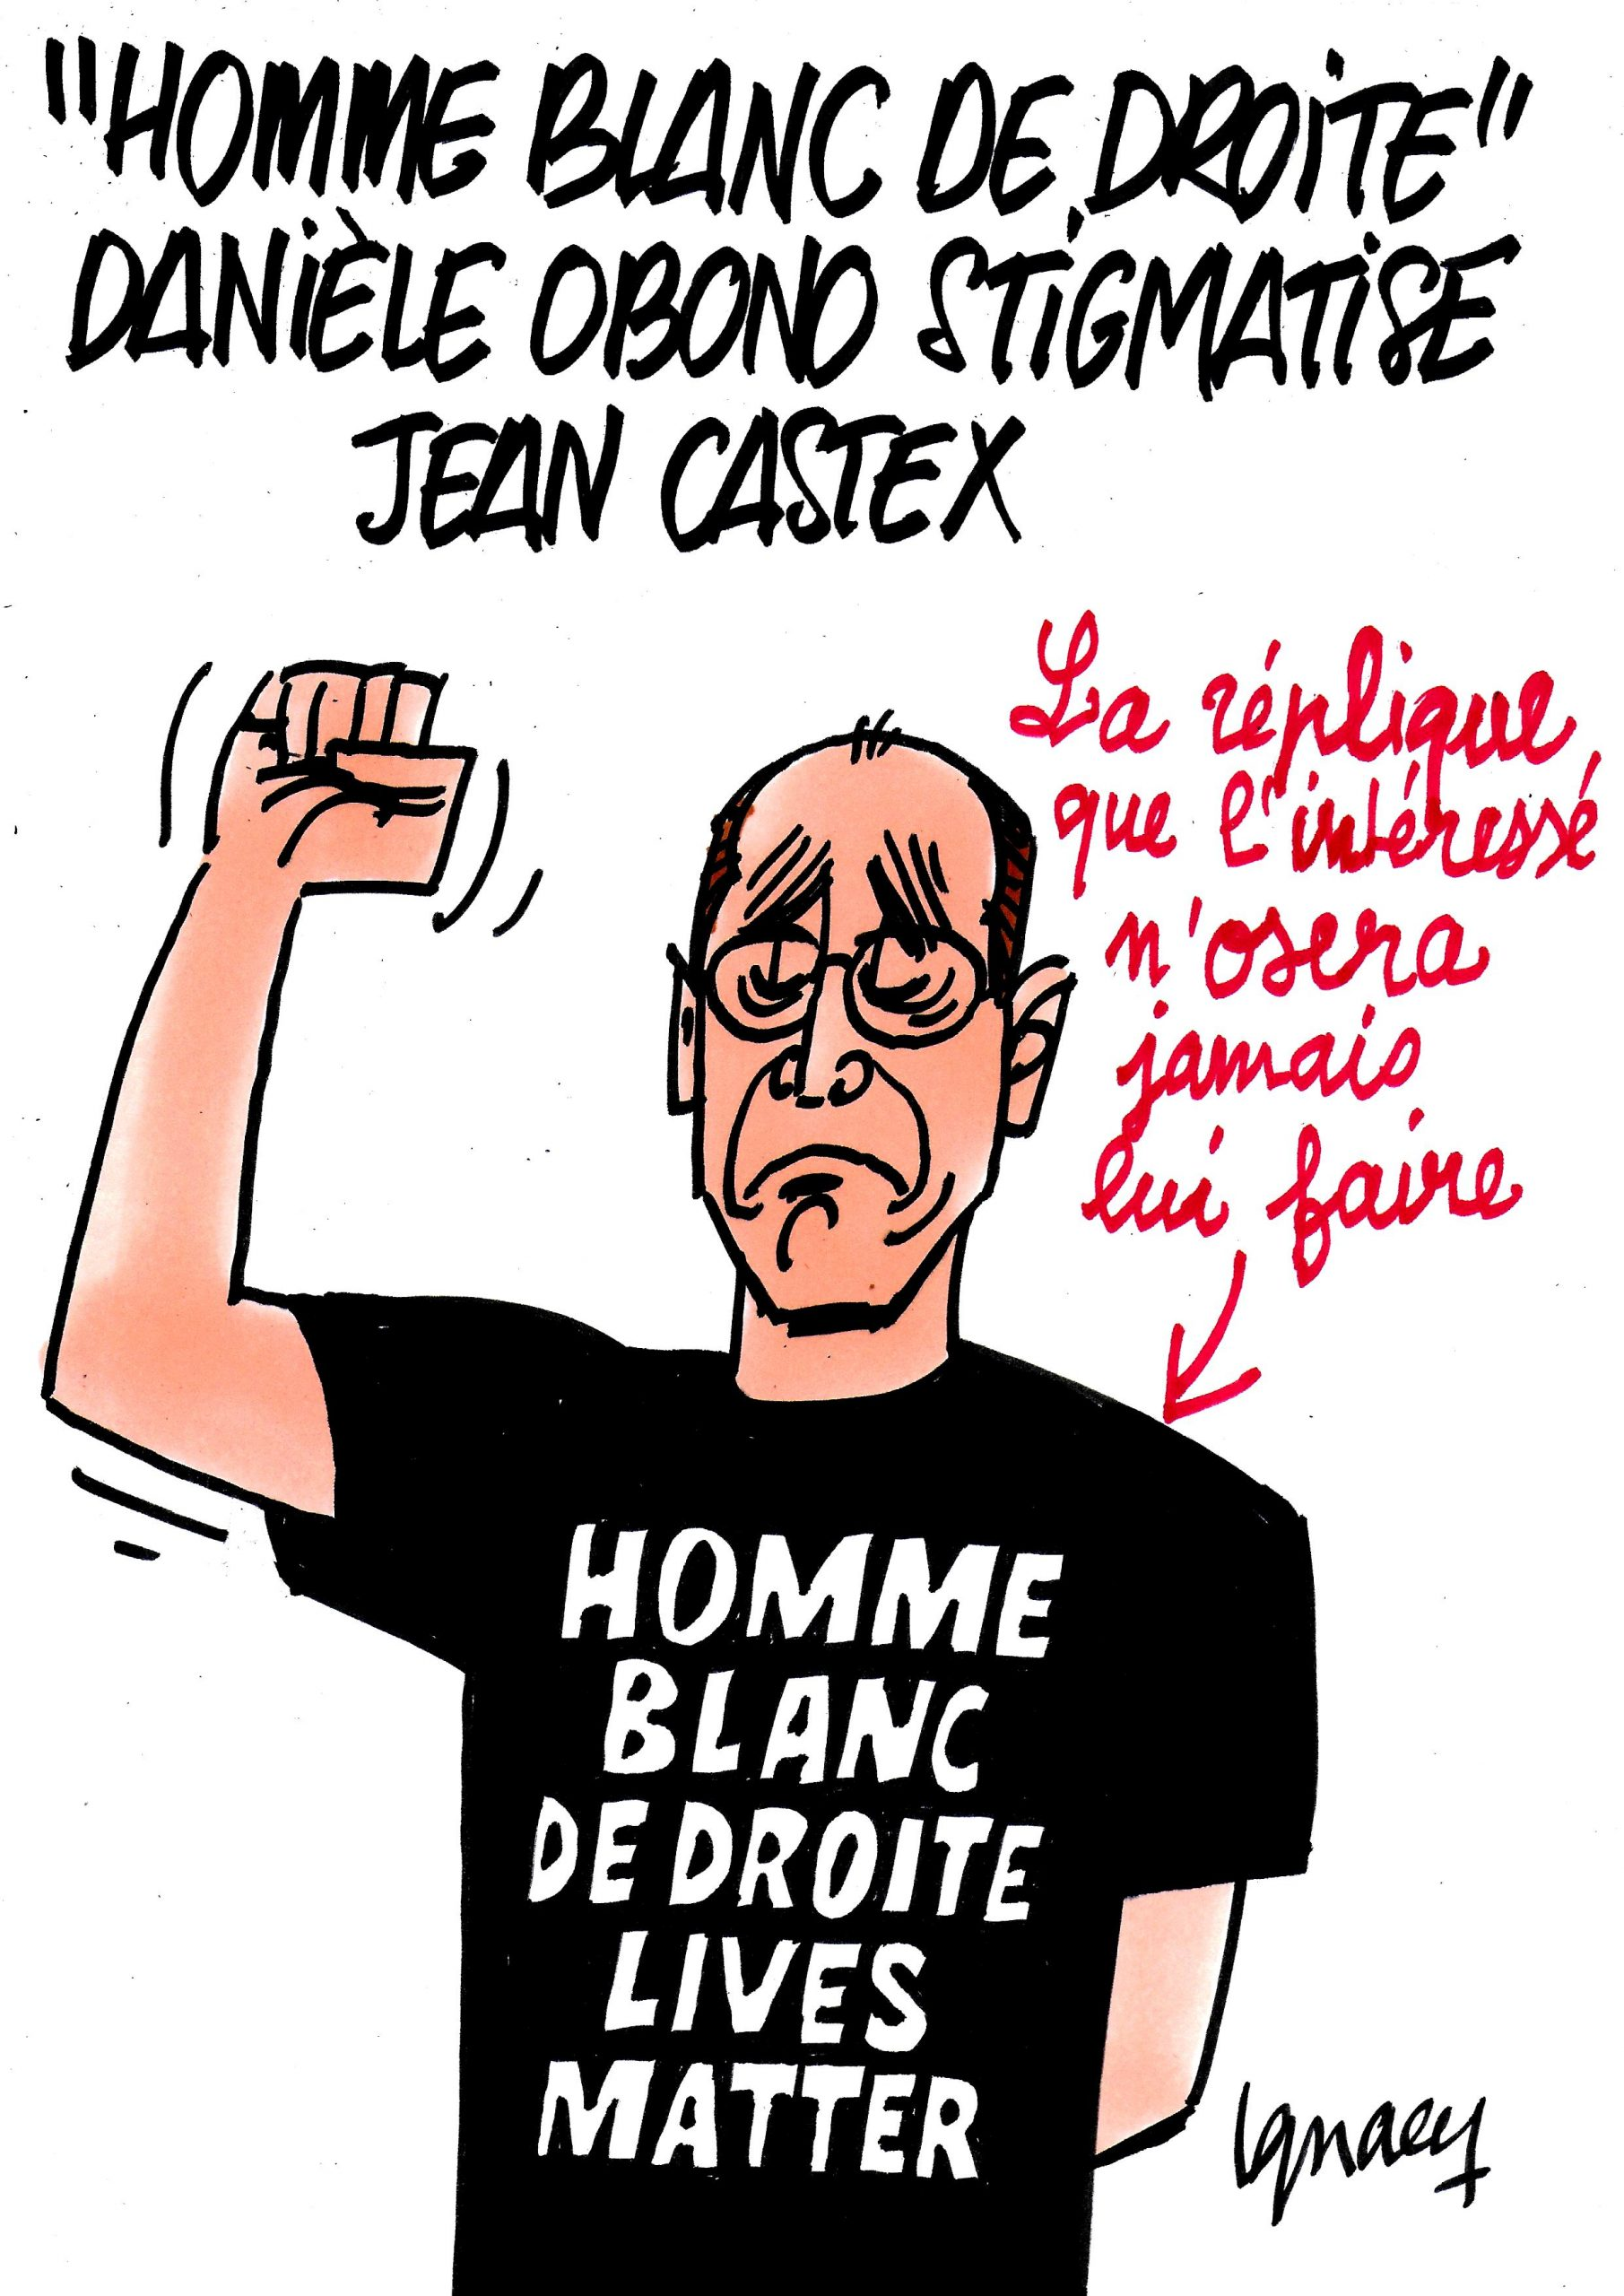 Ignace - Castex stigmatisé par Obono